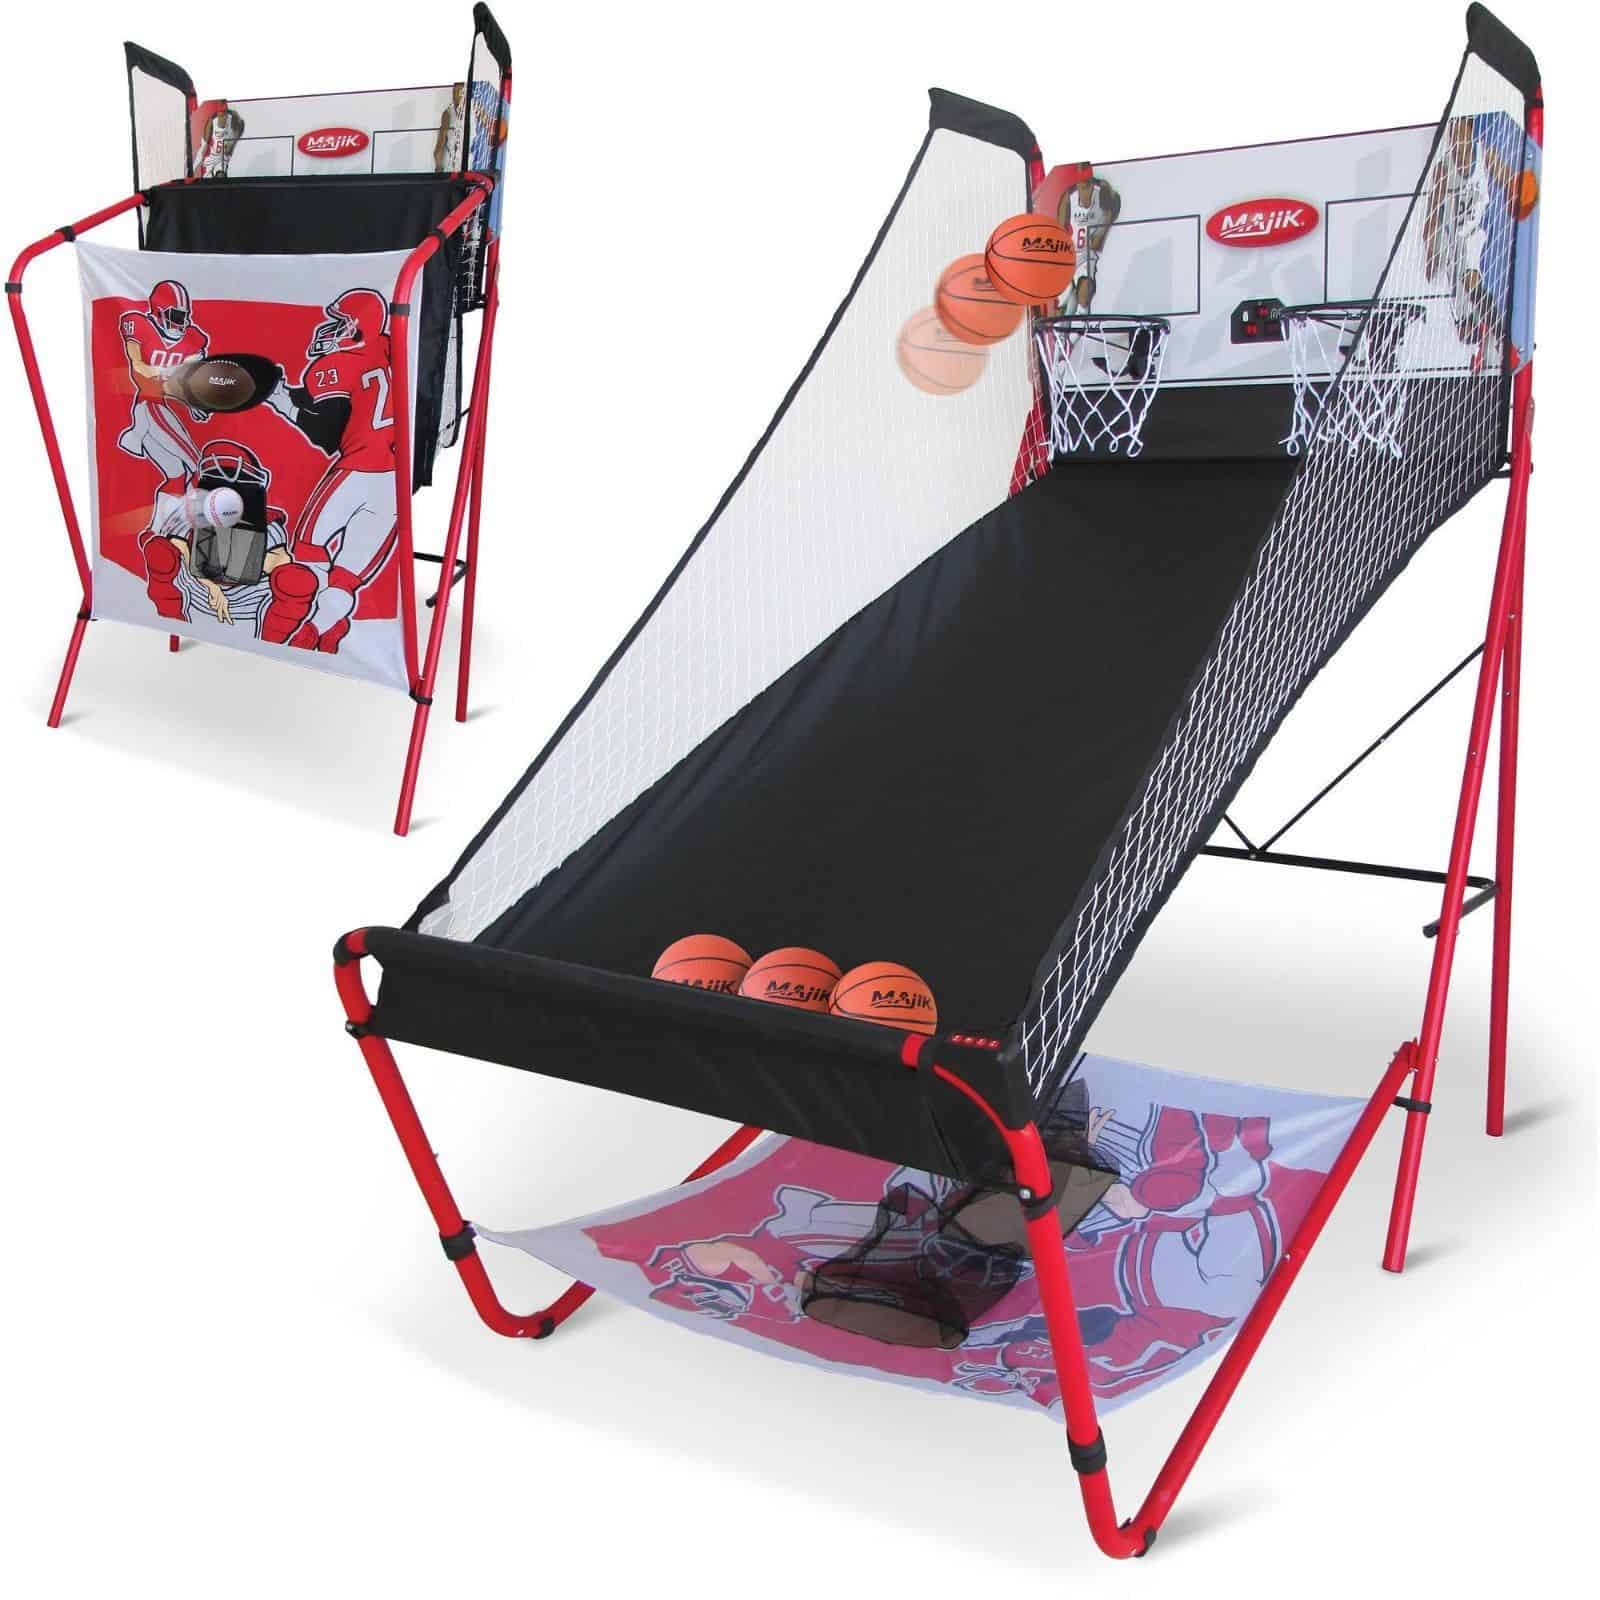 Basketball Arcade Game on www.girllovesglam.com